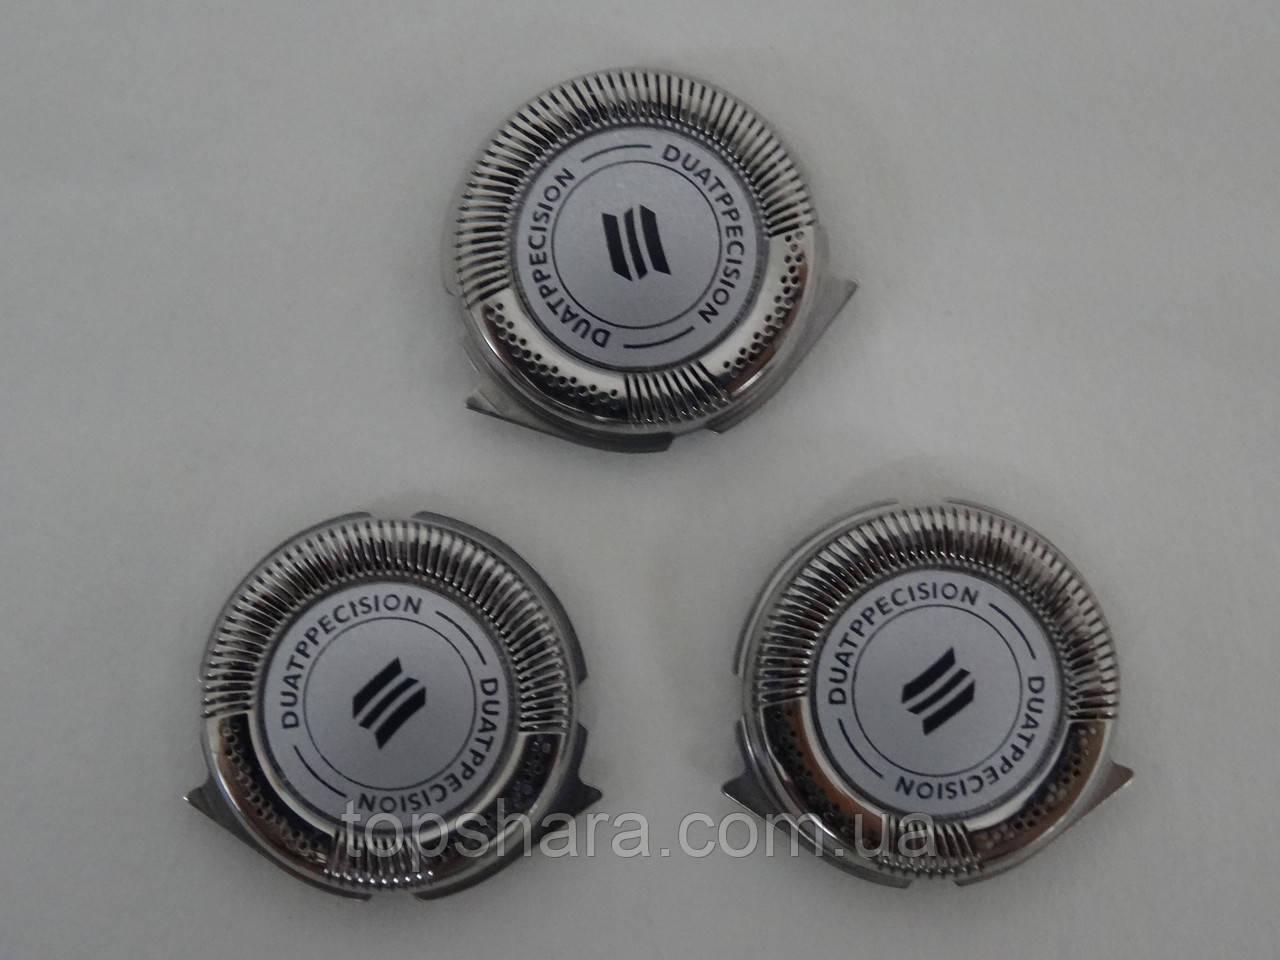 Сменные головки электробритвы Philips AT750, AT756, AT890, AT790, PT890